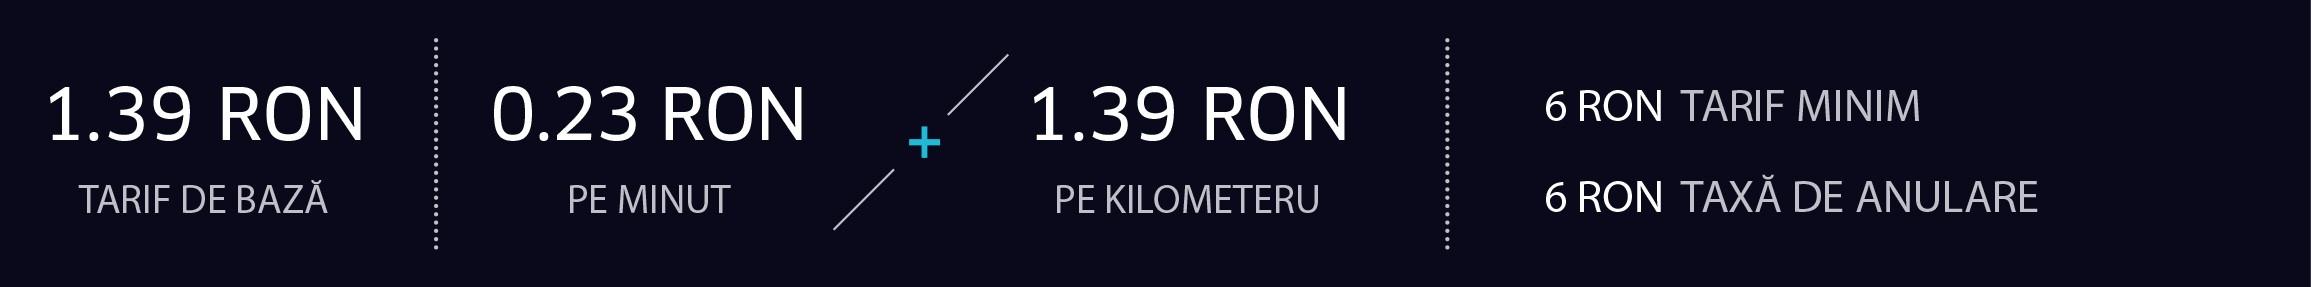 uberx_Romania_RON